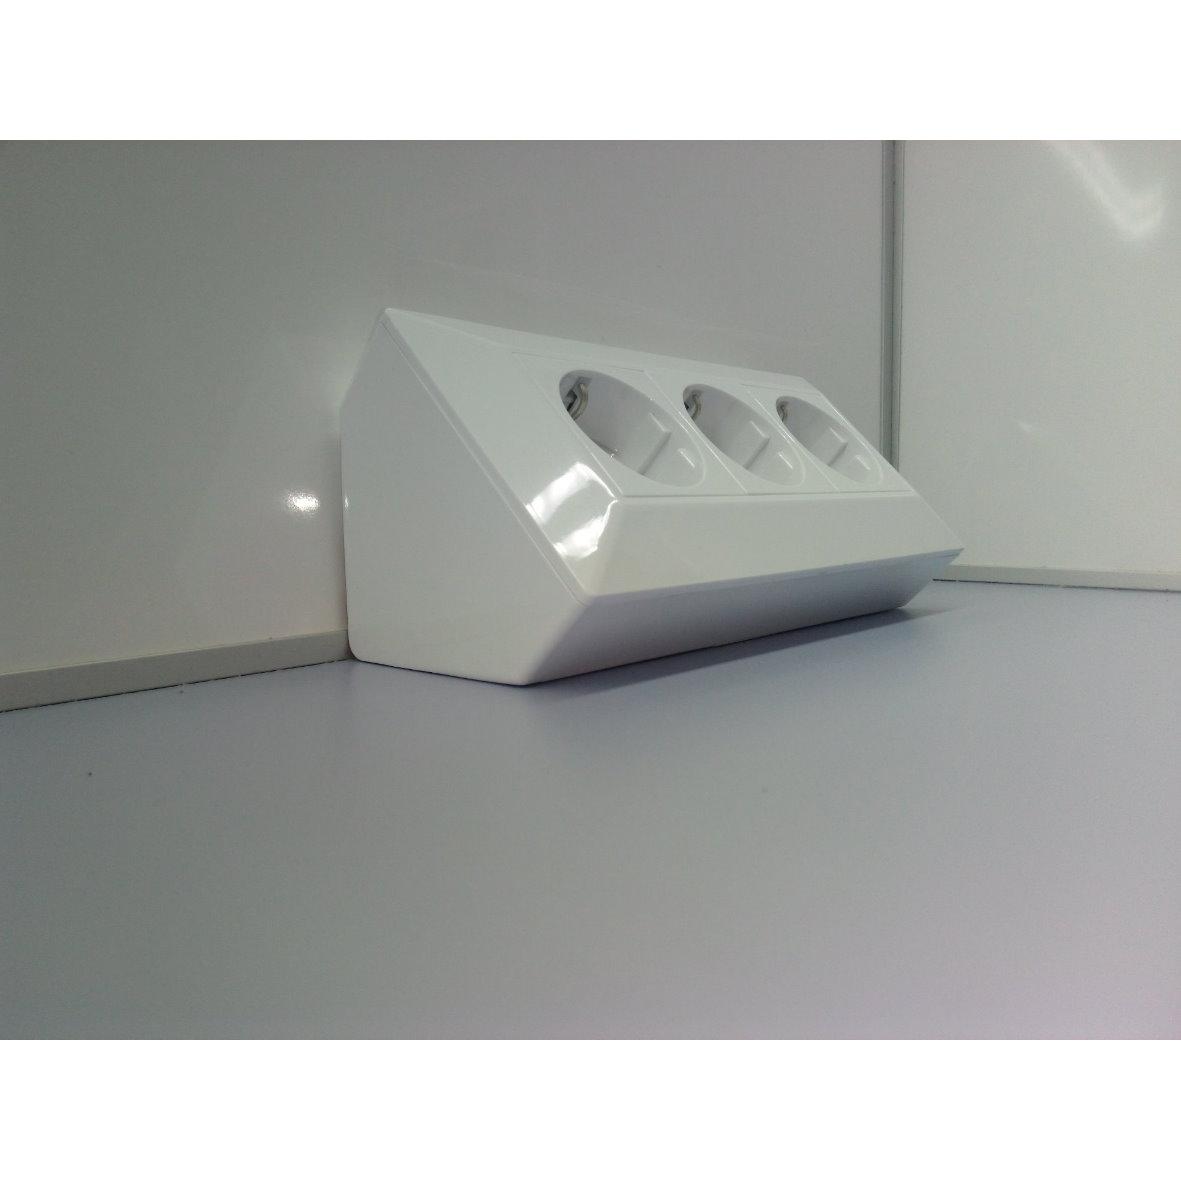 aufbau steckdose 3 fach weiss 21665. Black Bedroom Furniture Sets. Home Design Ideas